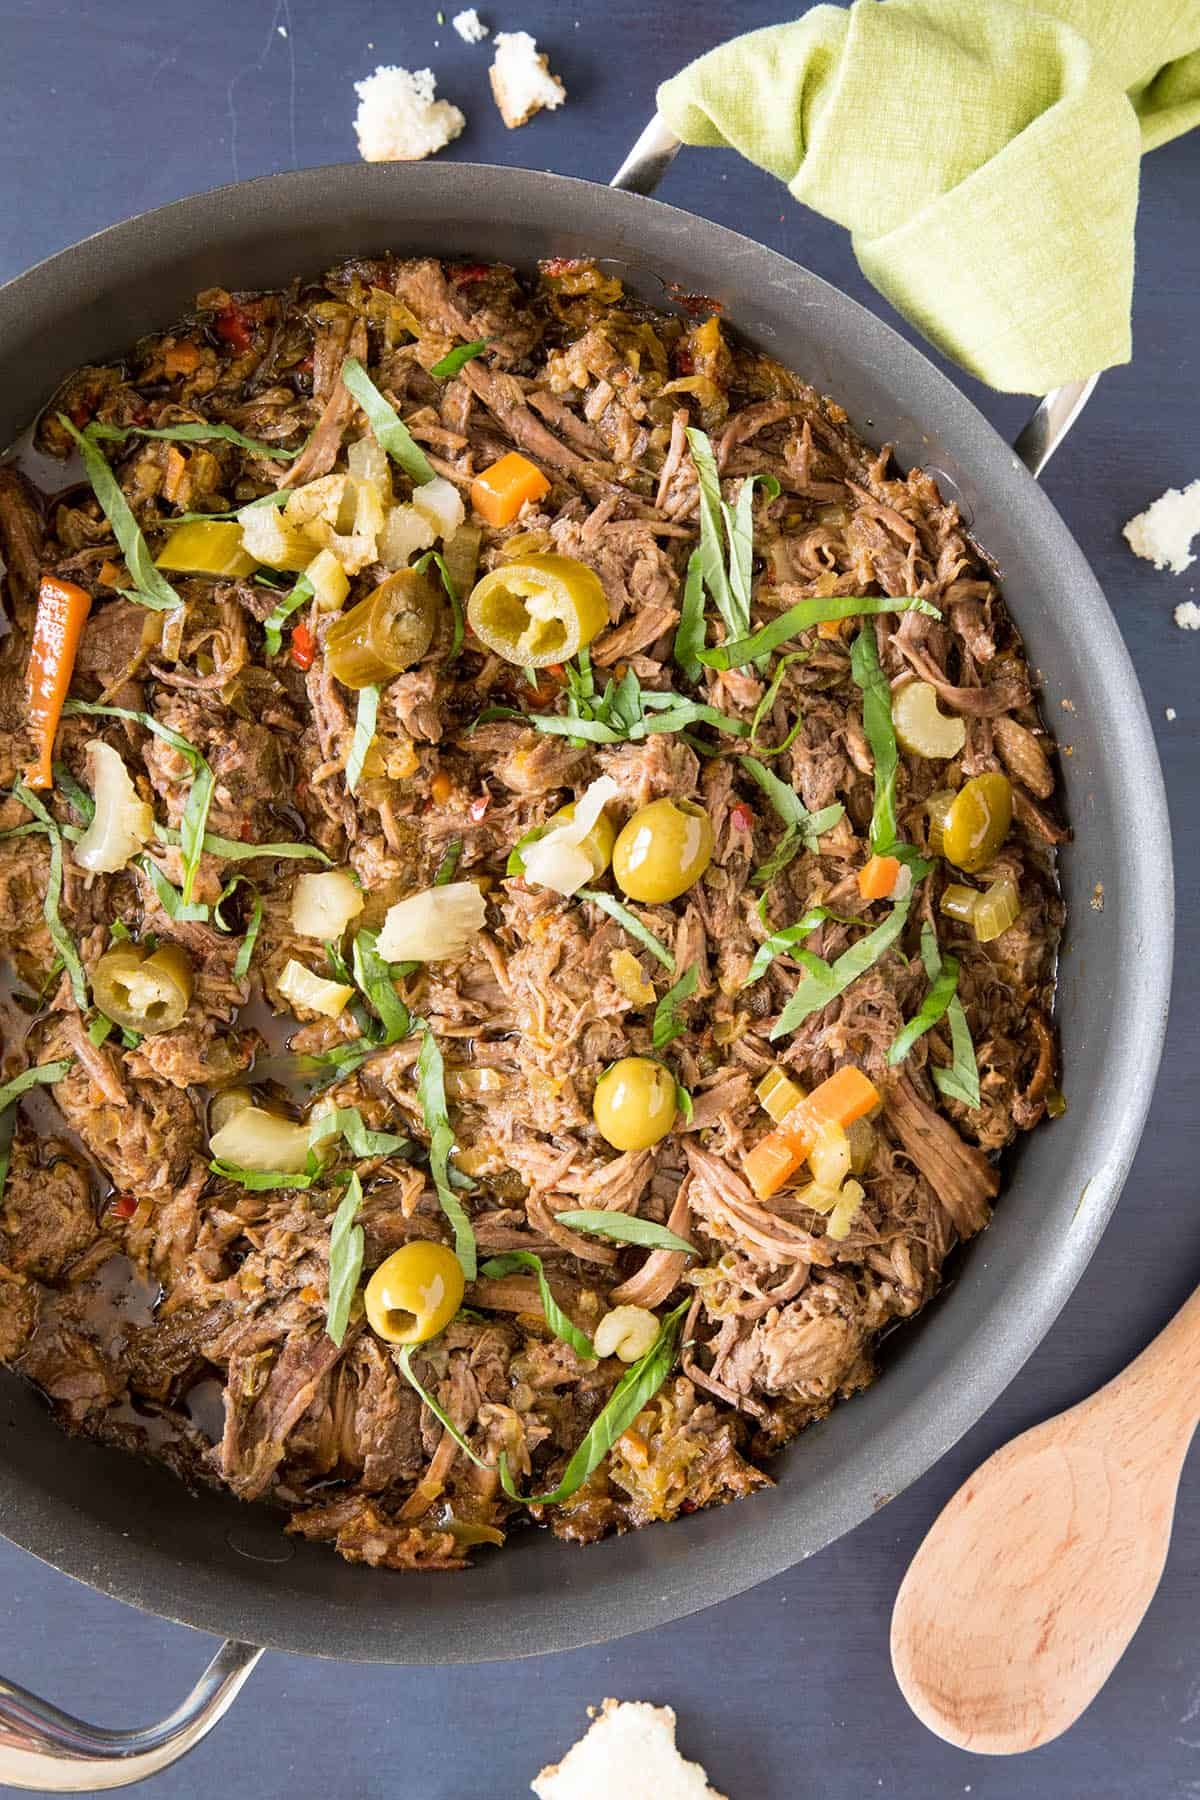 Feisty Italian Slow Cooker Pot Roast - This pot roast is super tender.